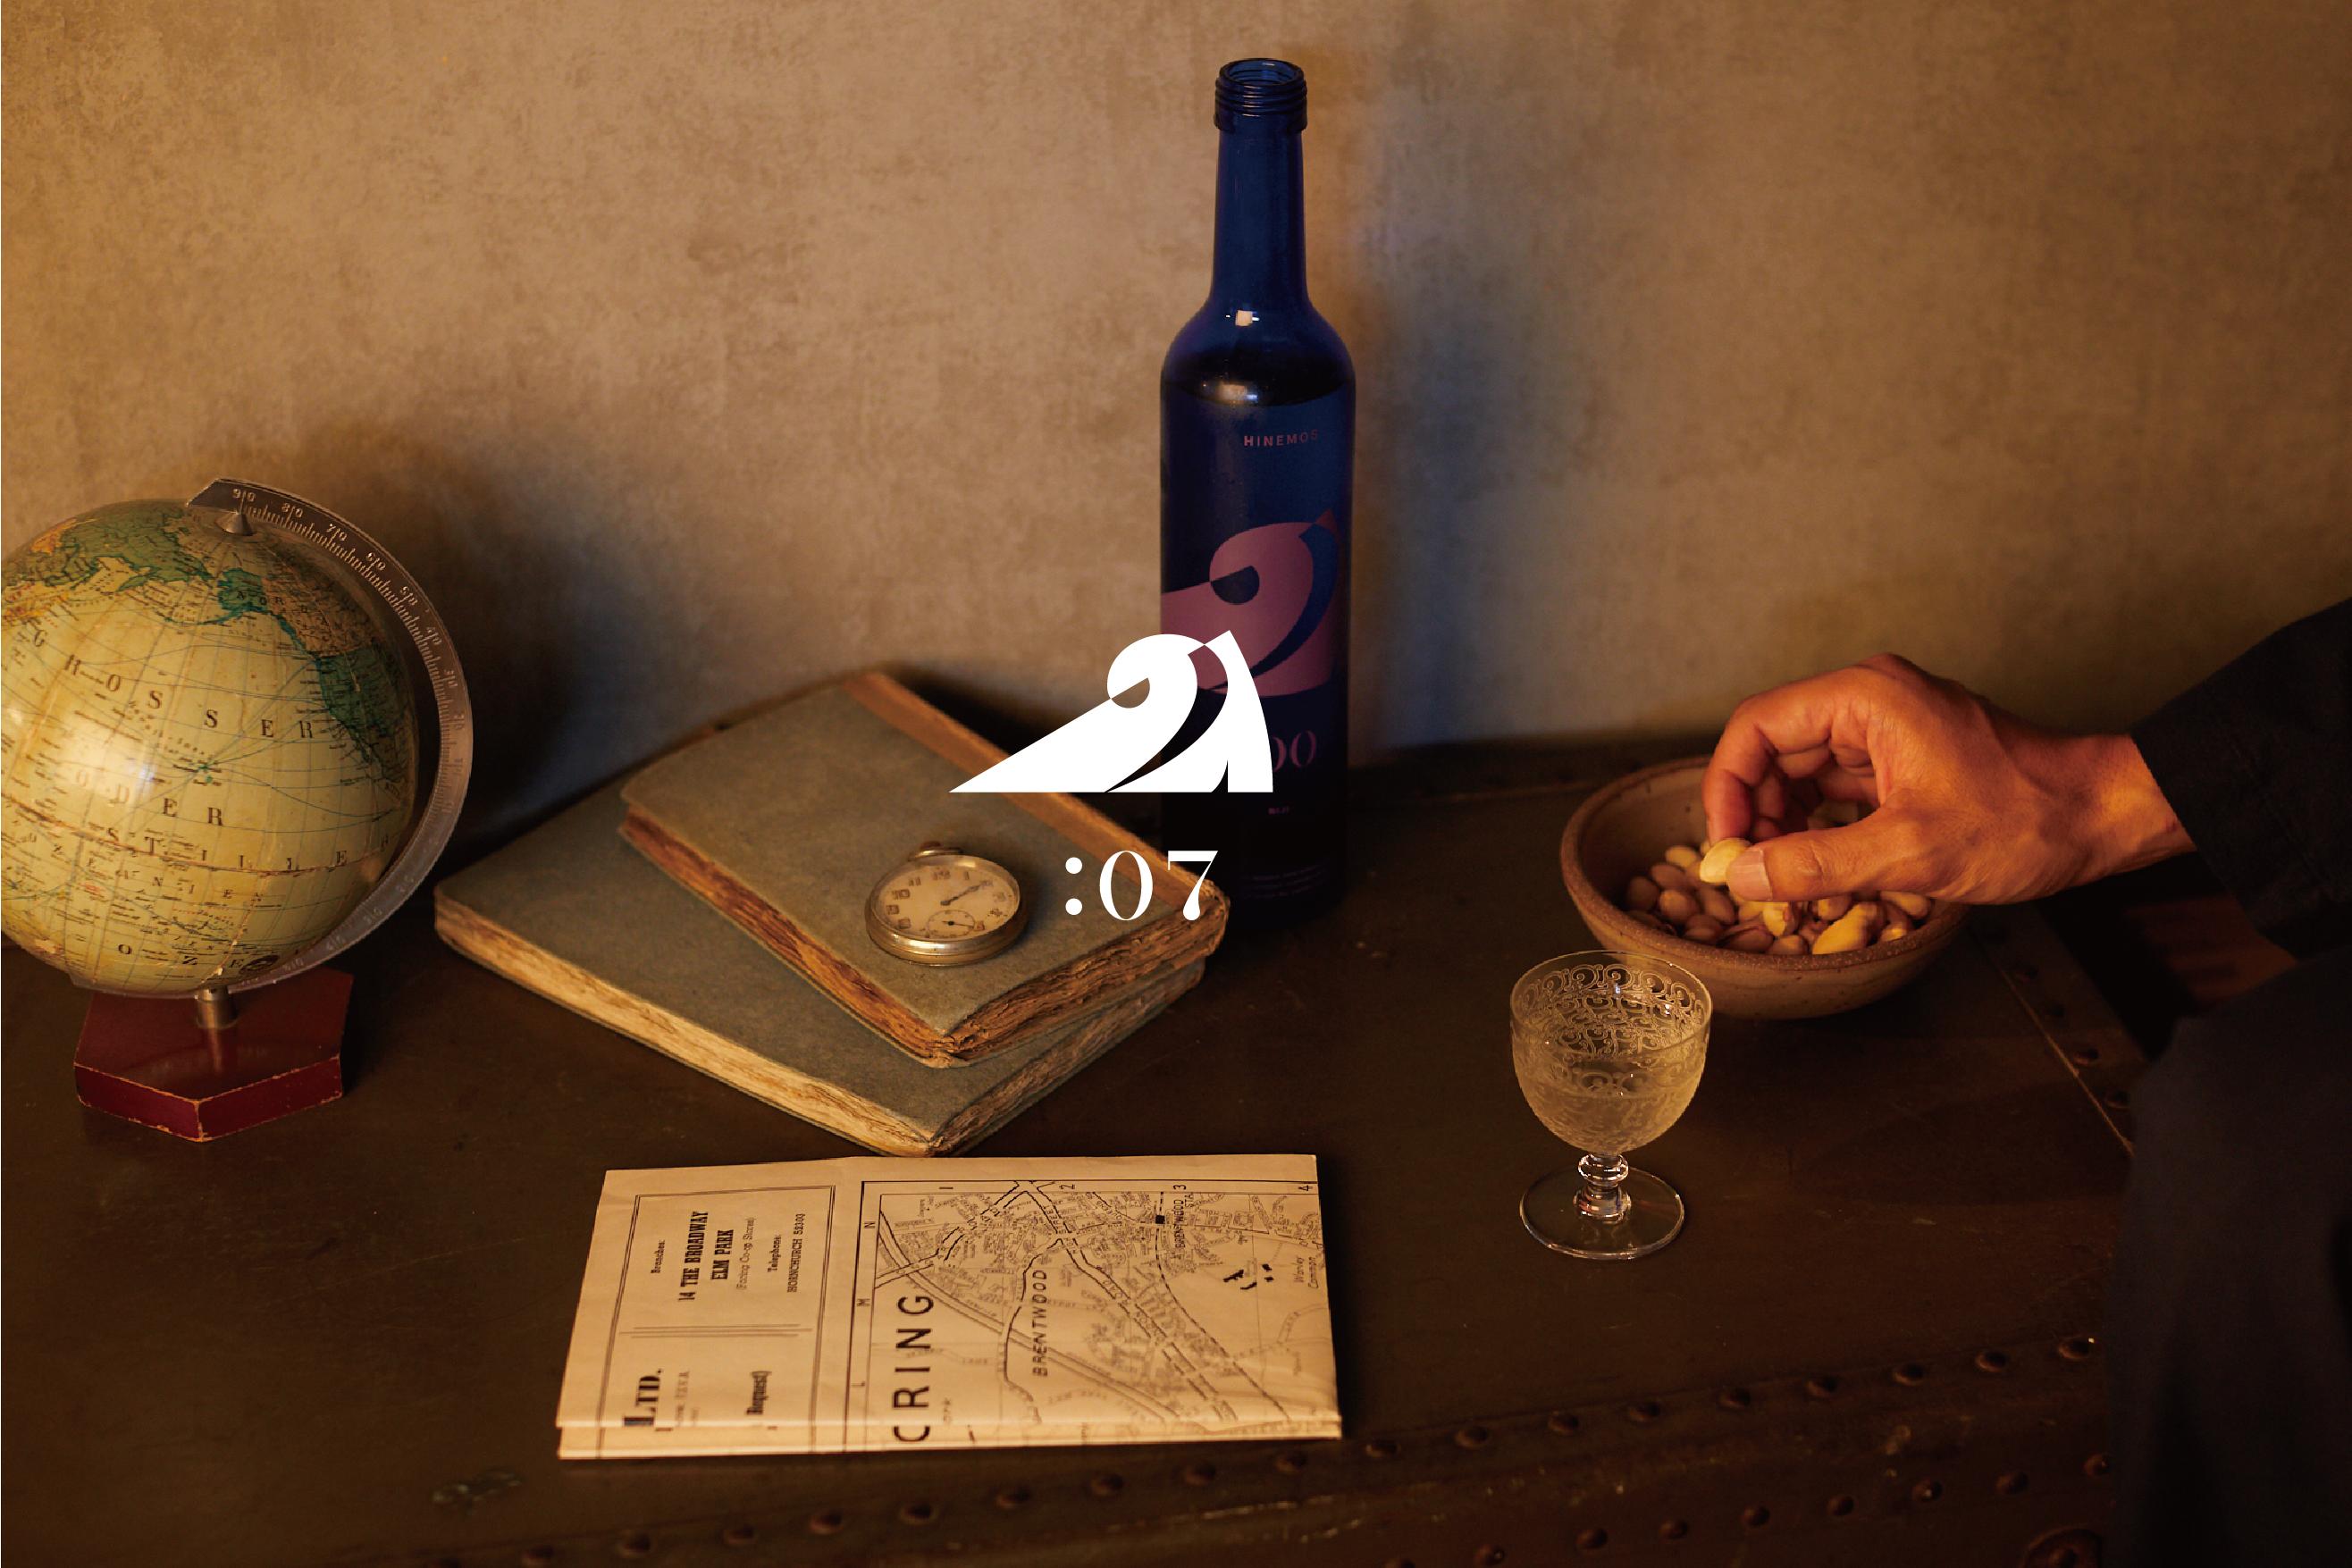 HINEMOSを酒プロジェクトがご紹介します。